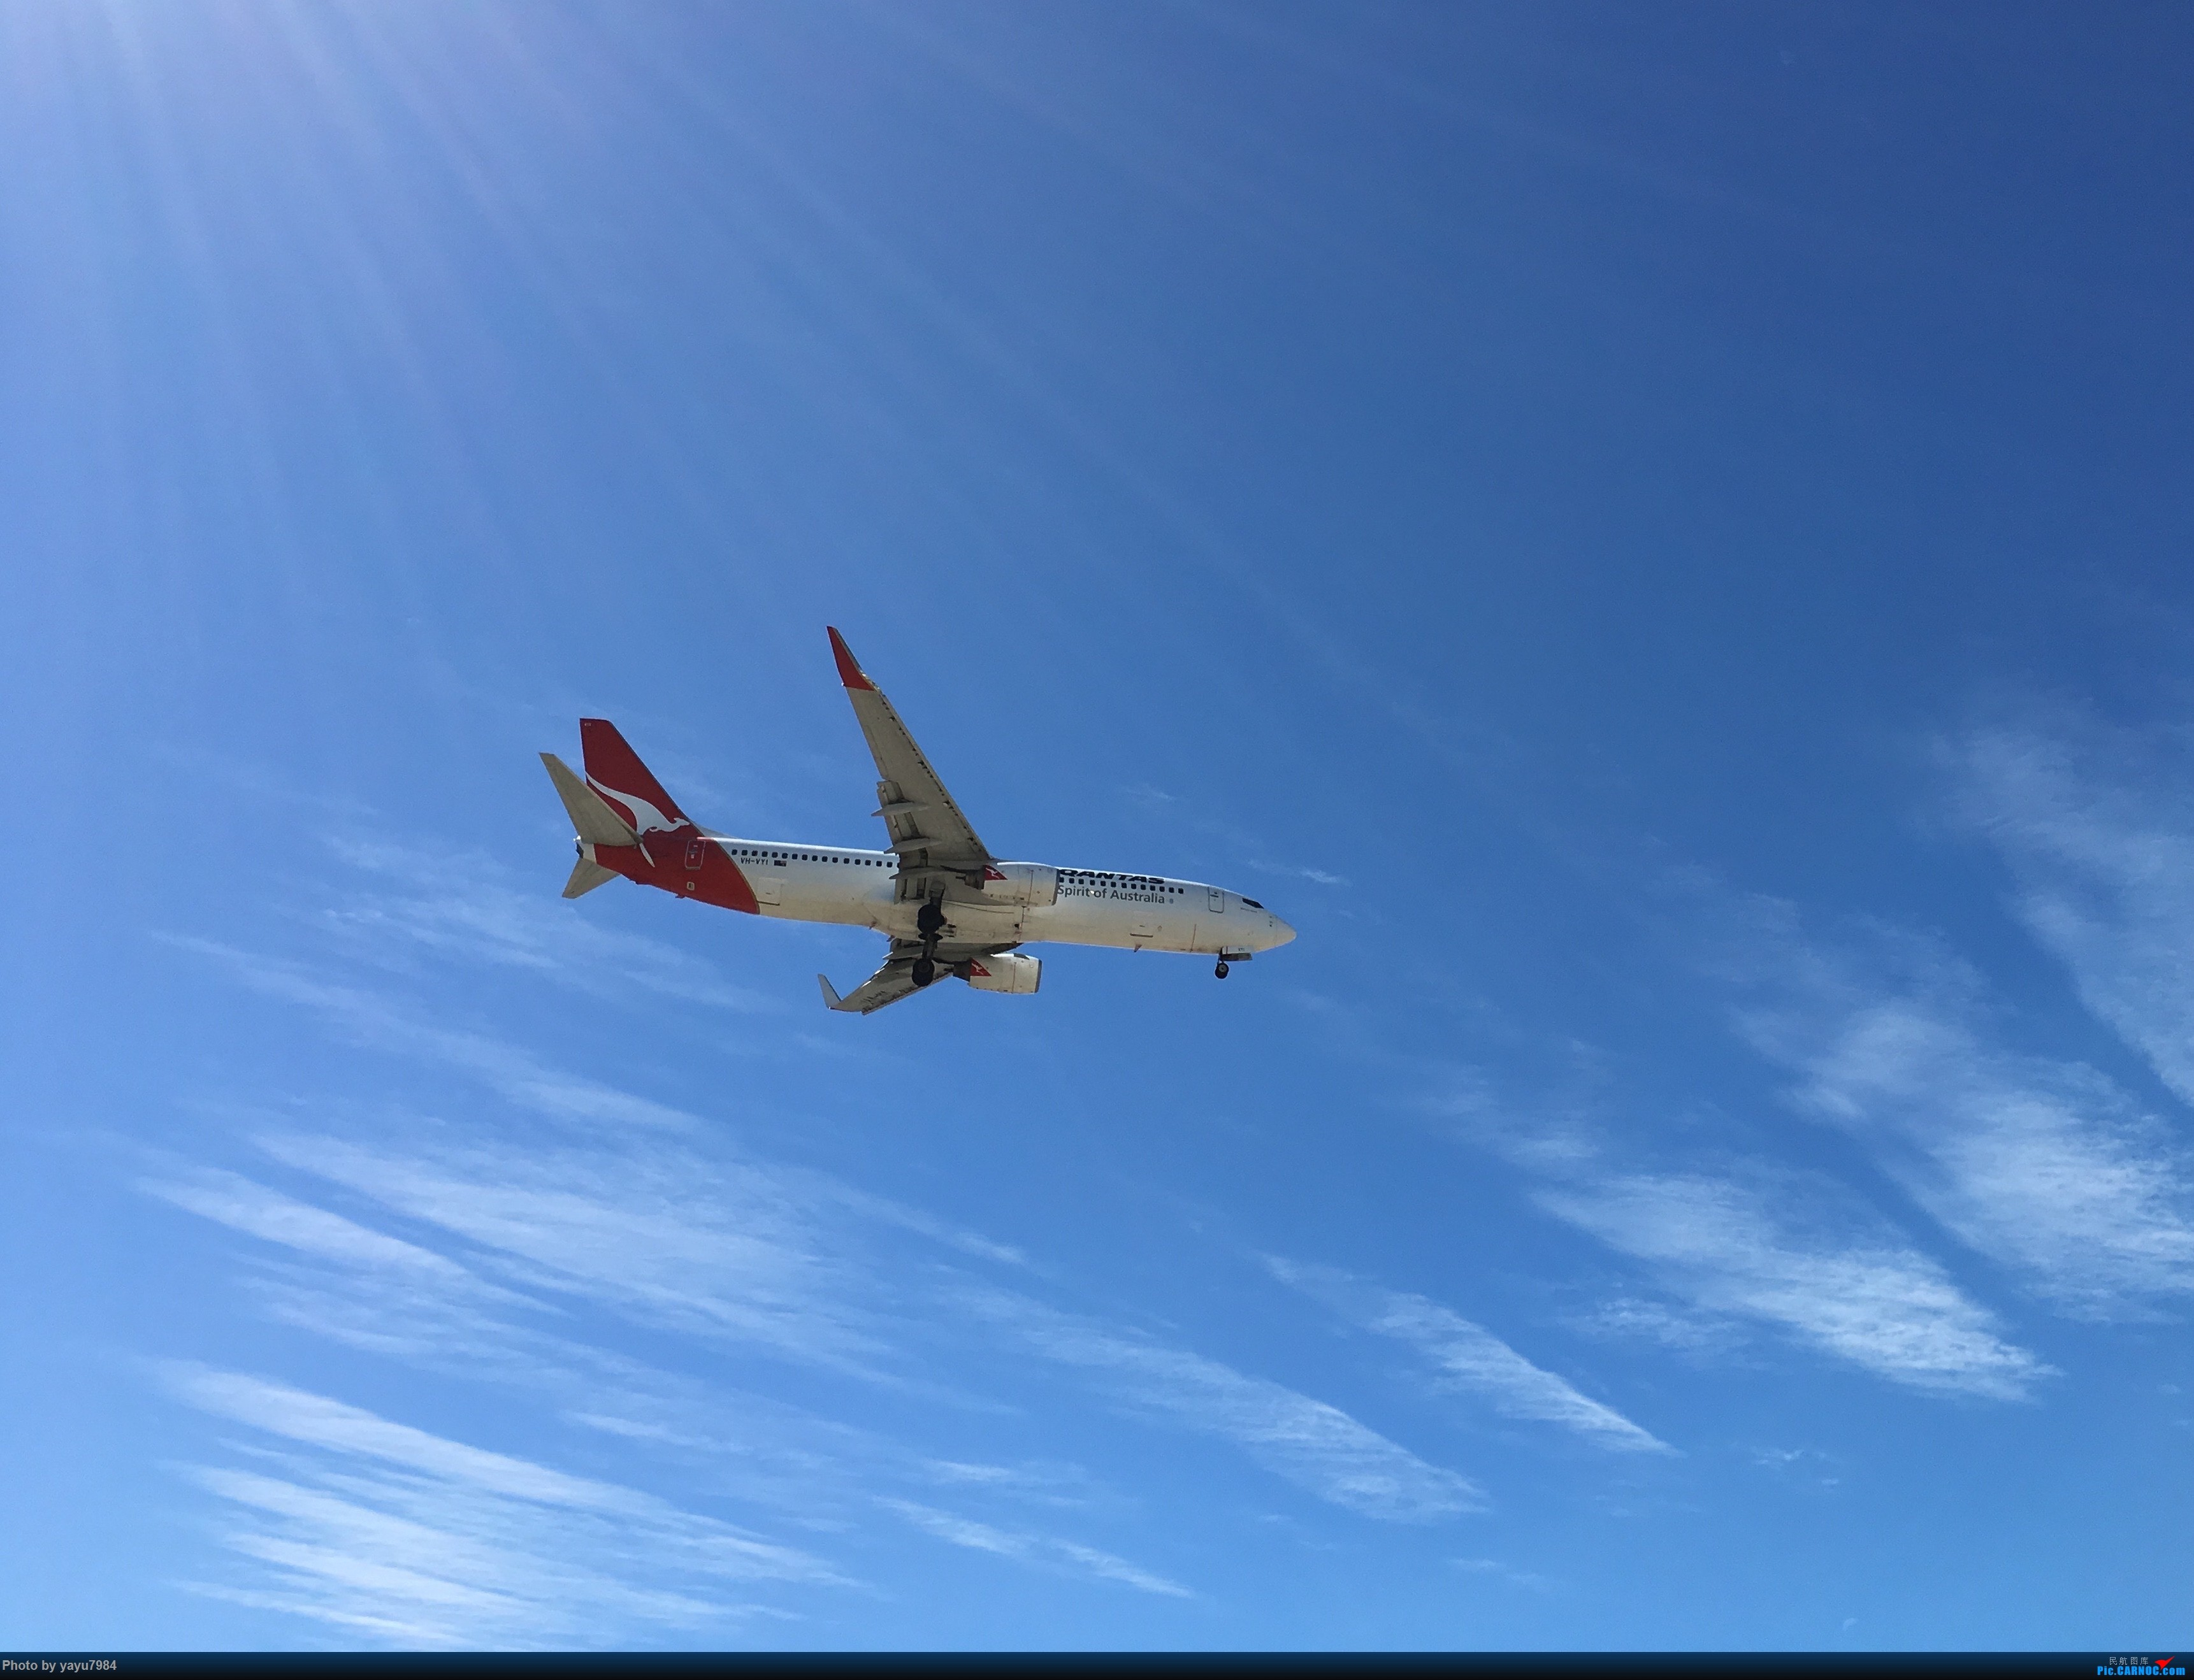 Re:[原创][SYD] 久违的南向起降,纪录16R拍机之行 BOEING 737-800 VH-VYI 澳大利亚悉尼金斯福德·史密斯机场